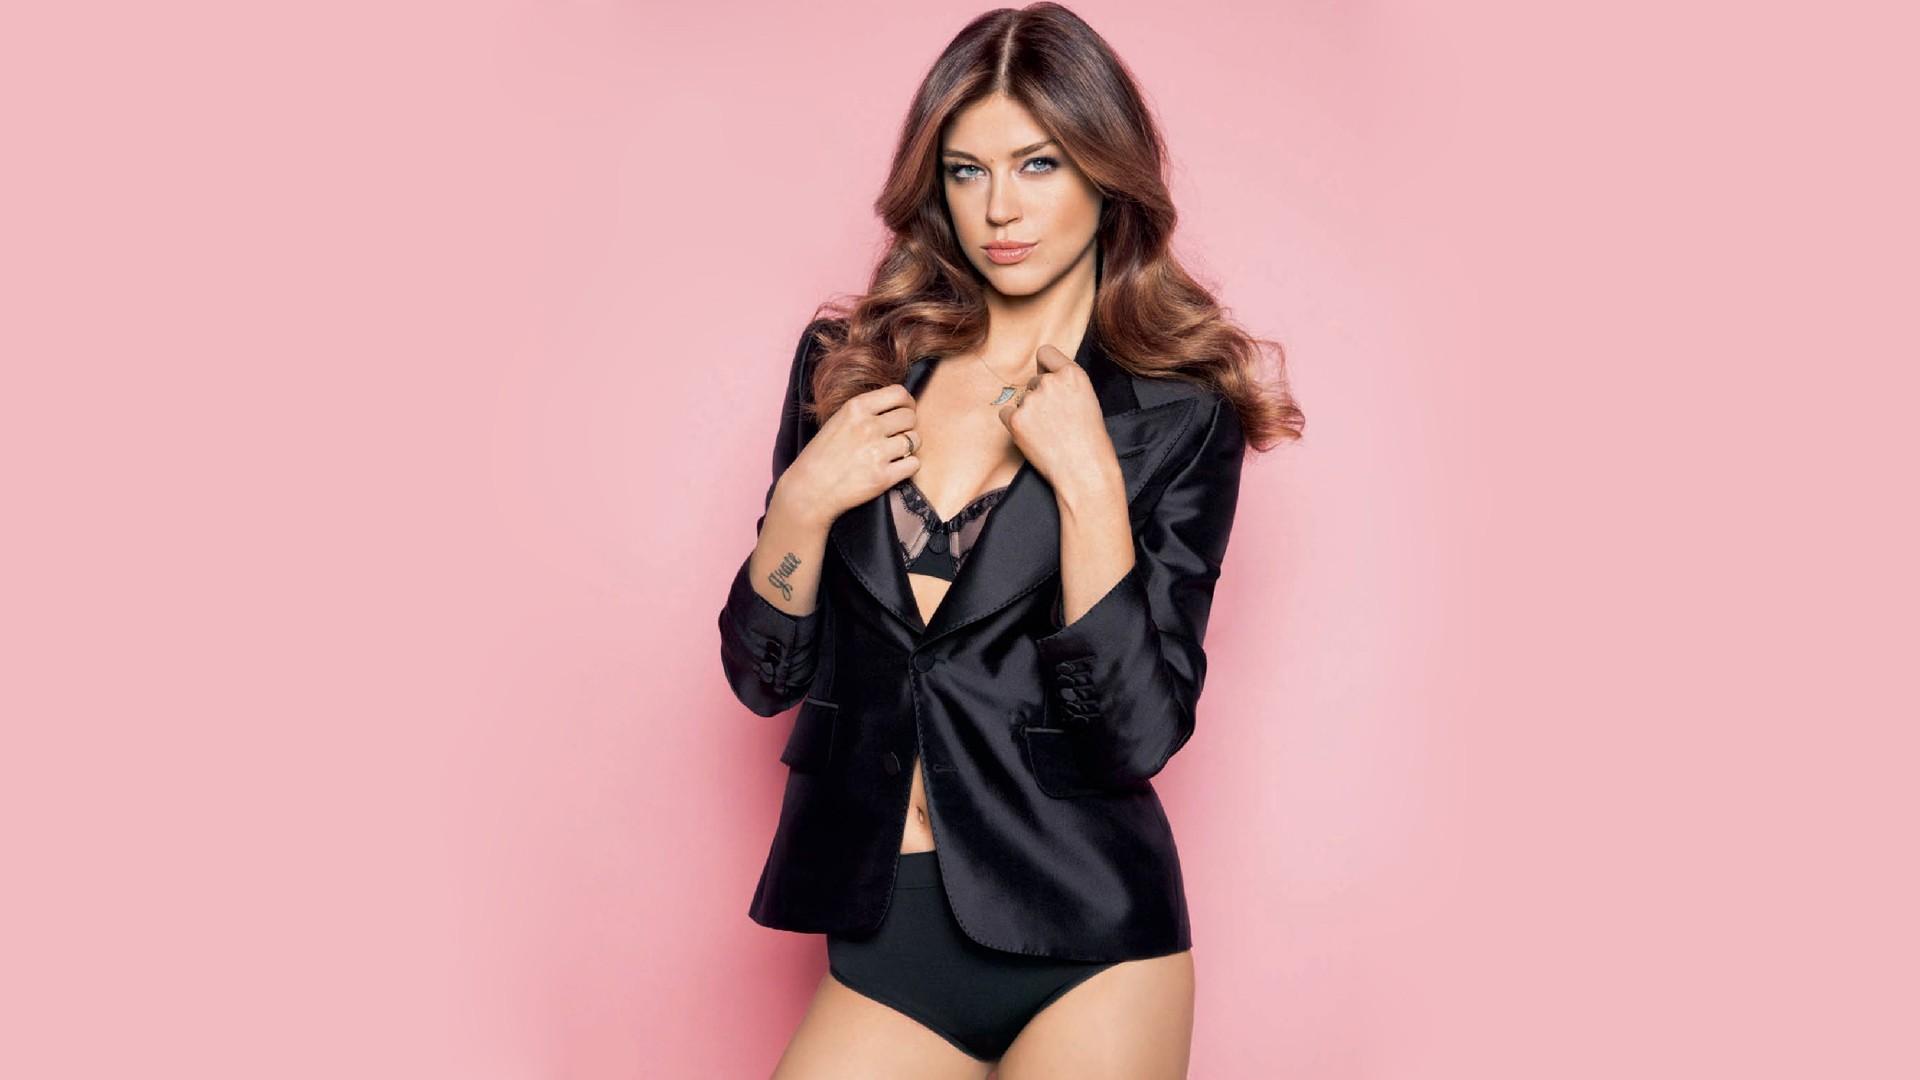 wallpaper model brunette actress adrianne palicki tattoo